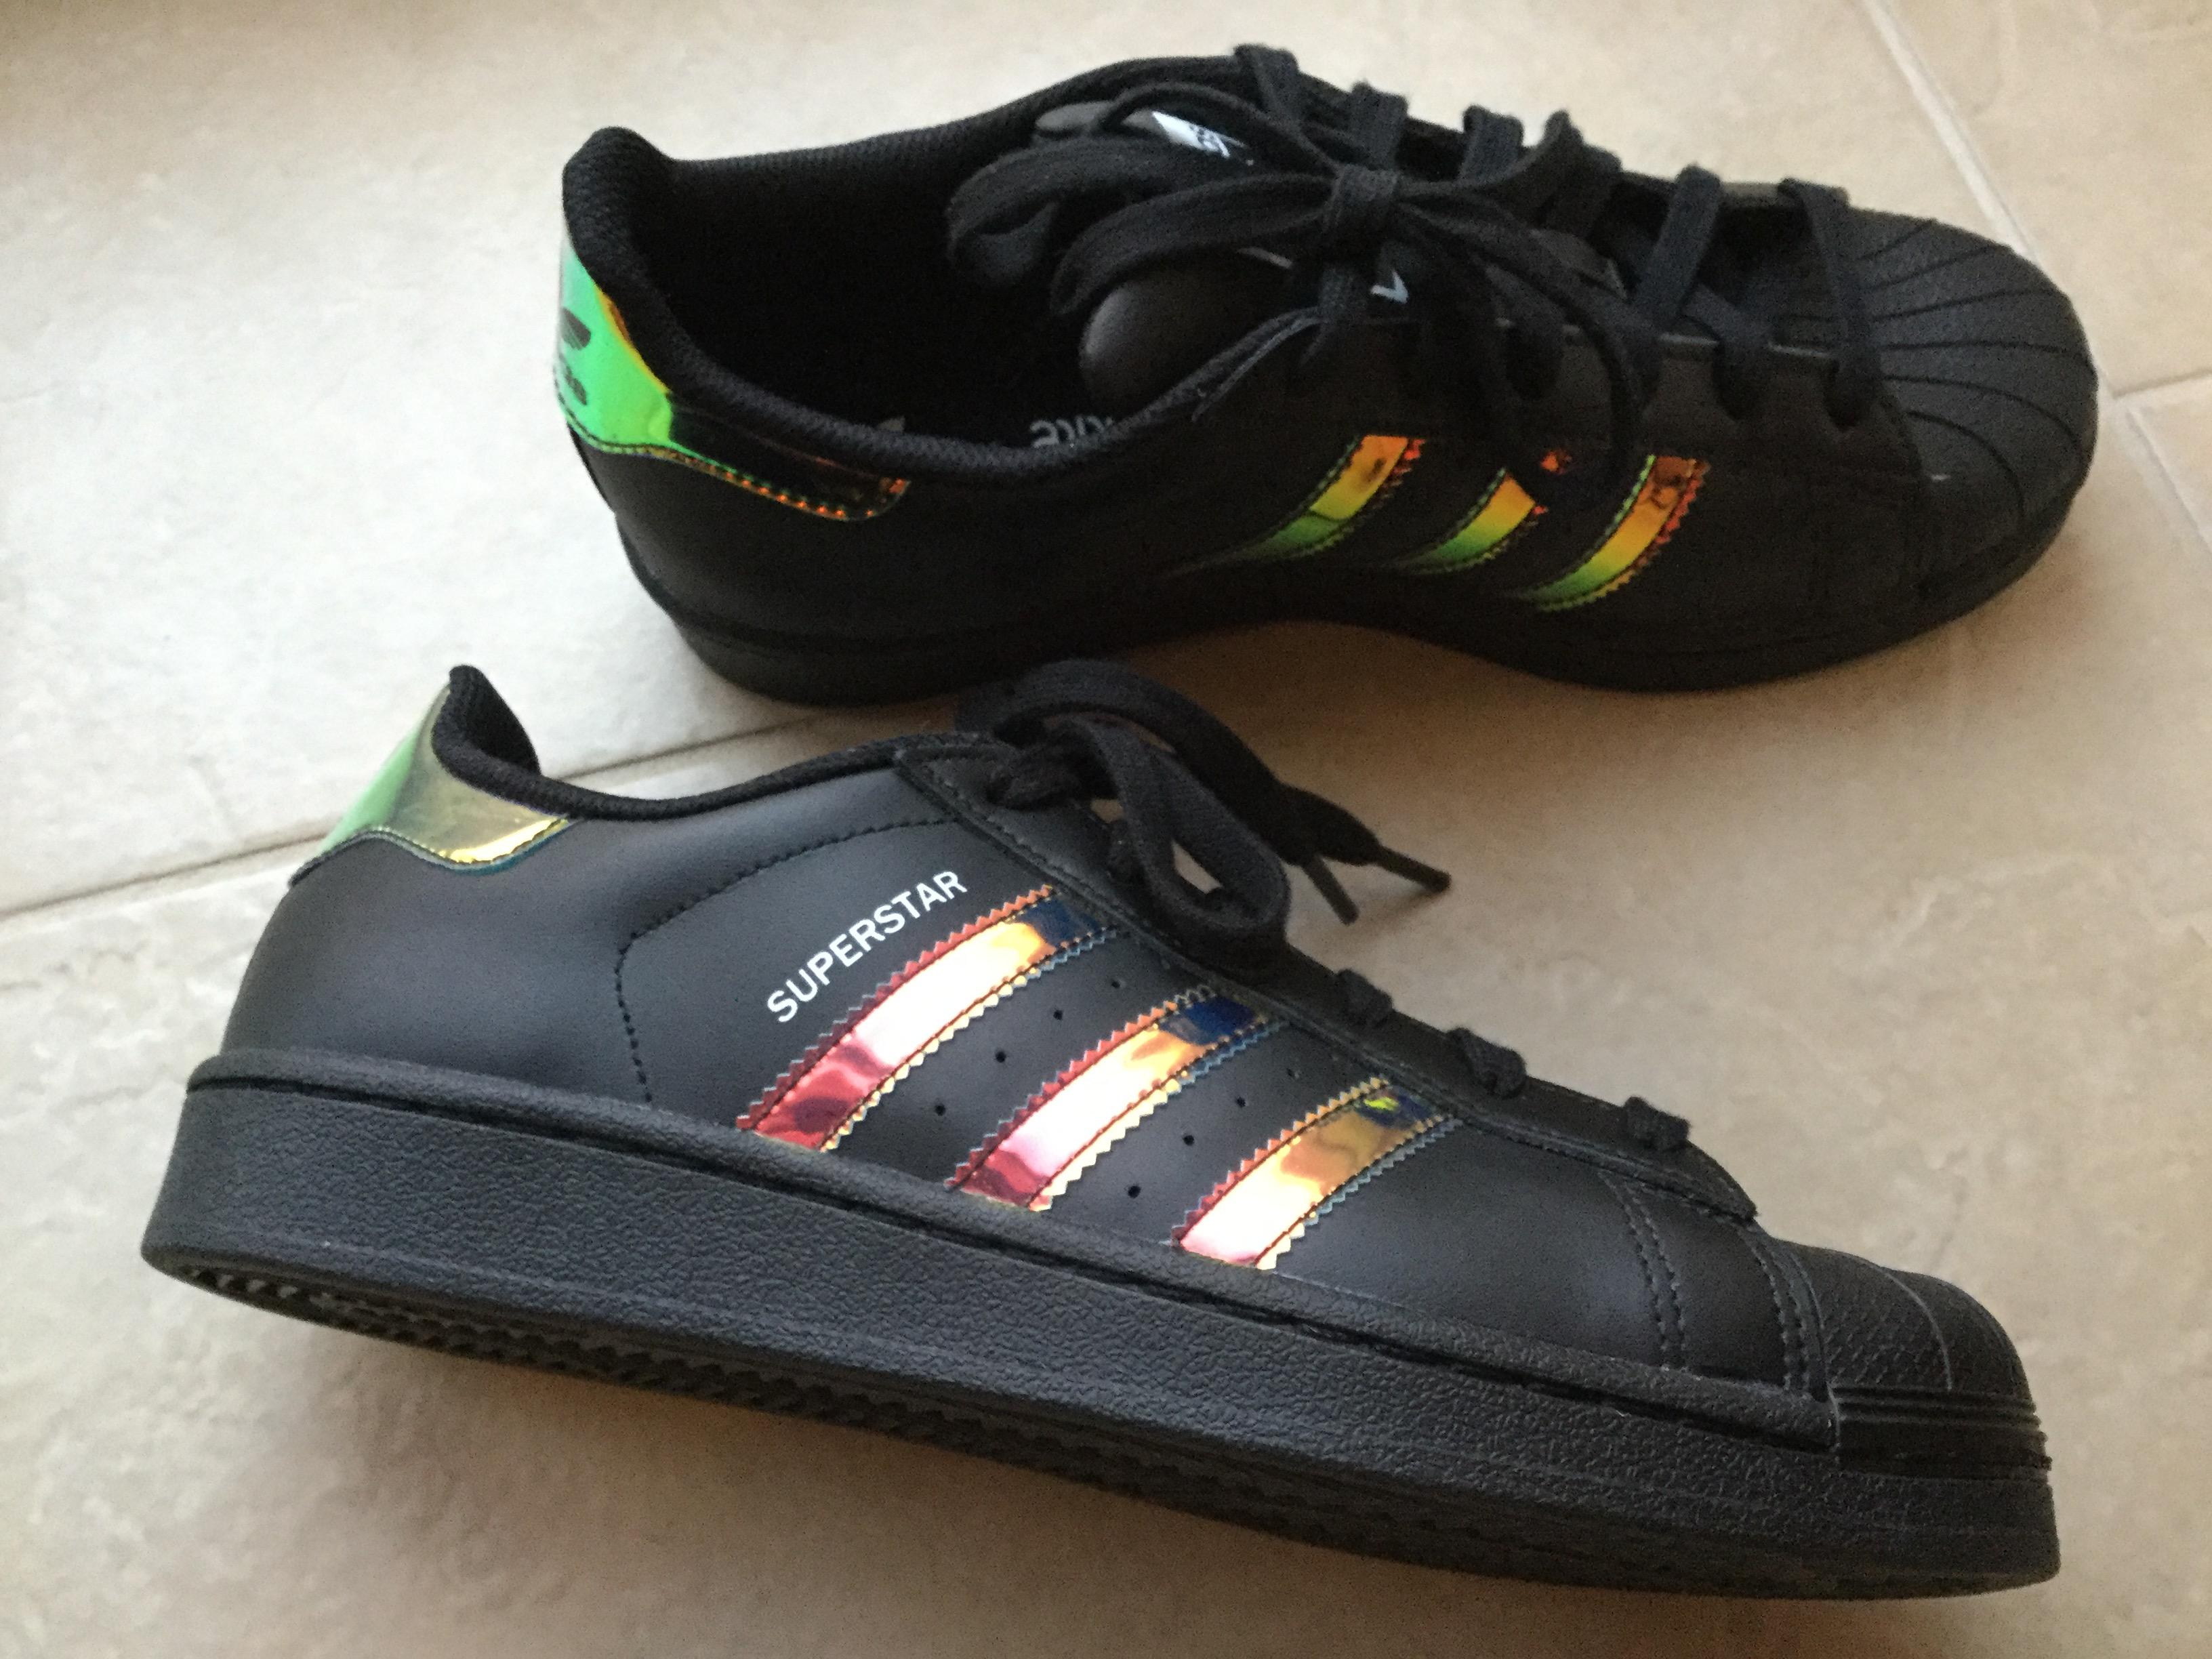 adidas superstar black adidas superstar holographic black - ❤️ WVBCNUW